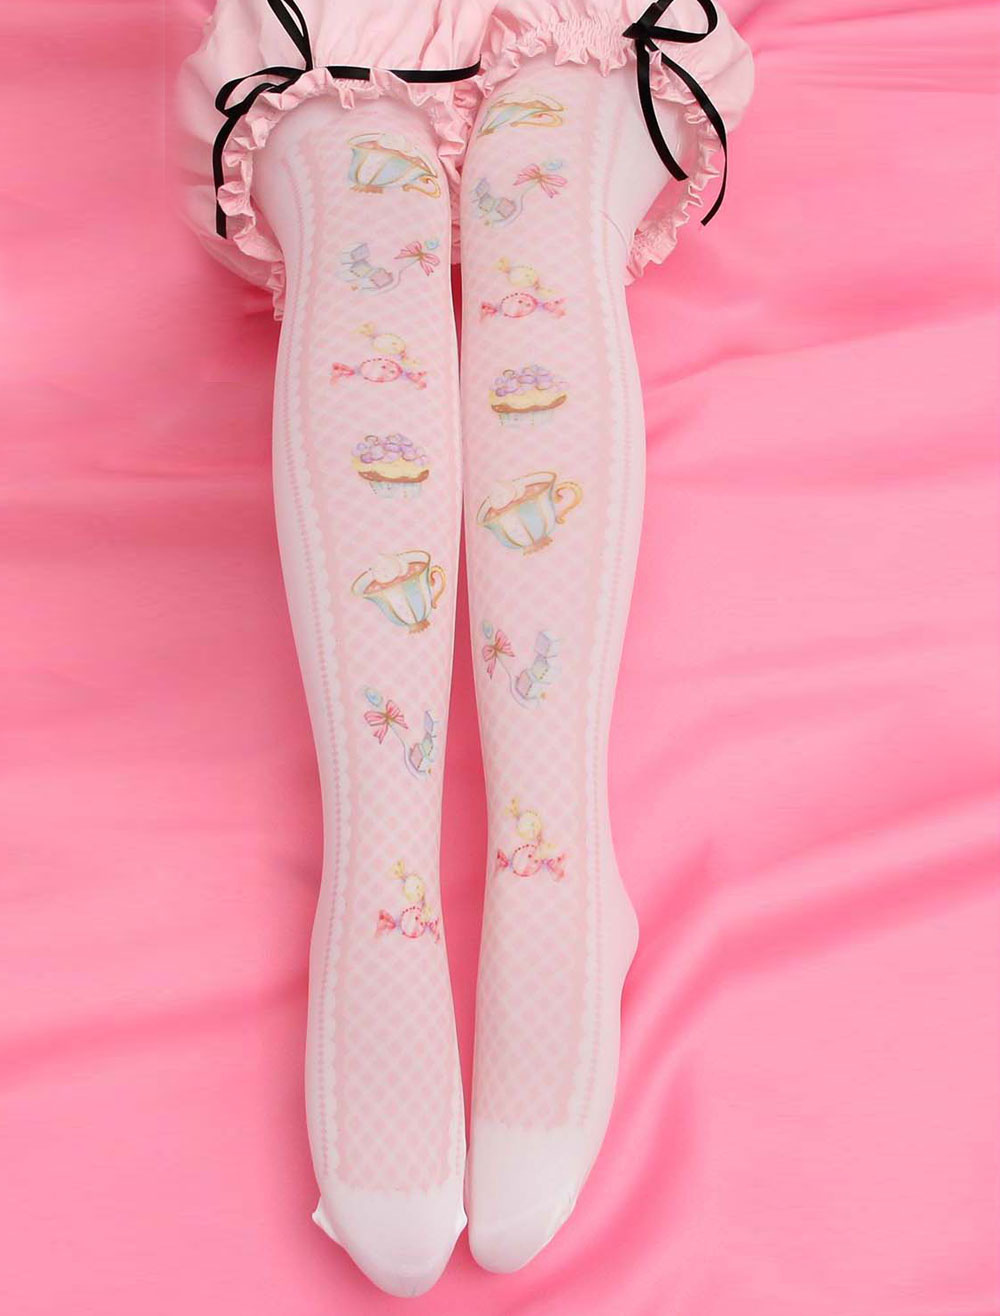 Buy Sweet Lolita Stockings Pink Printed Lolita Knee High Socks for $4.99 in Milanoo store